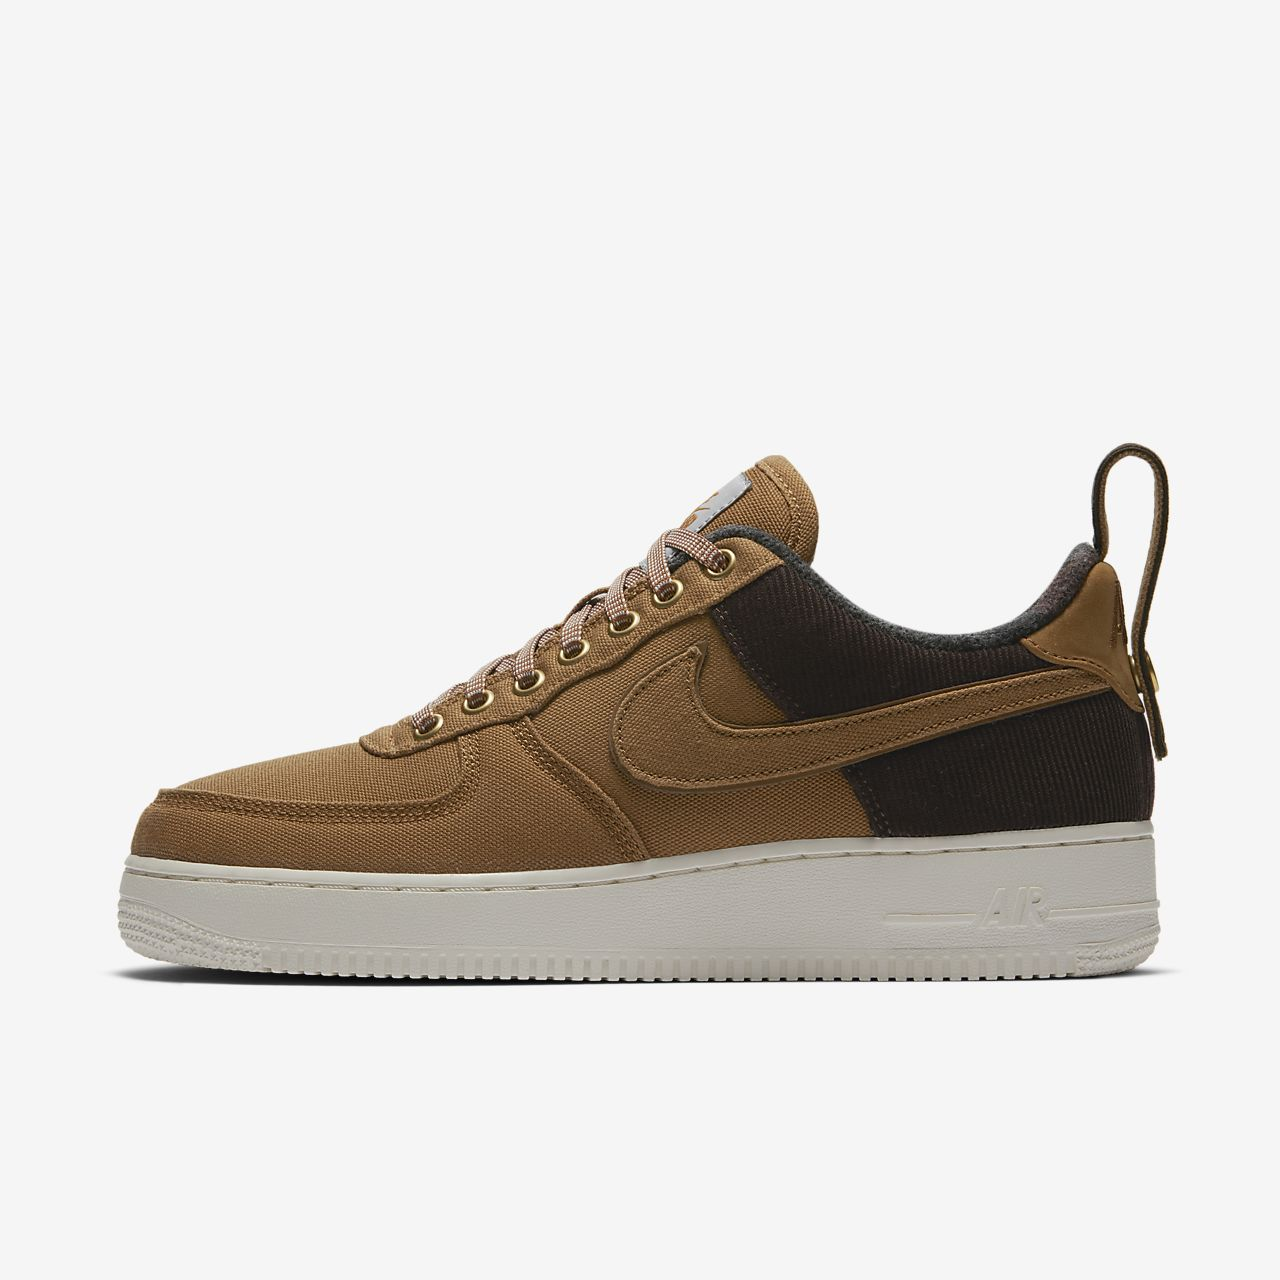 info for 6a519 55e67 ... Buty męskie Nike x Carhartt WIP Air Force 1